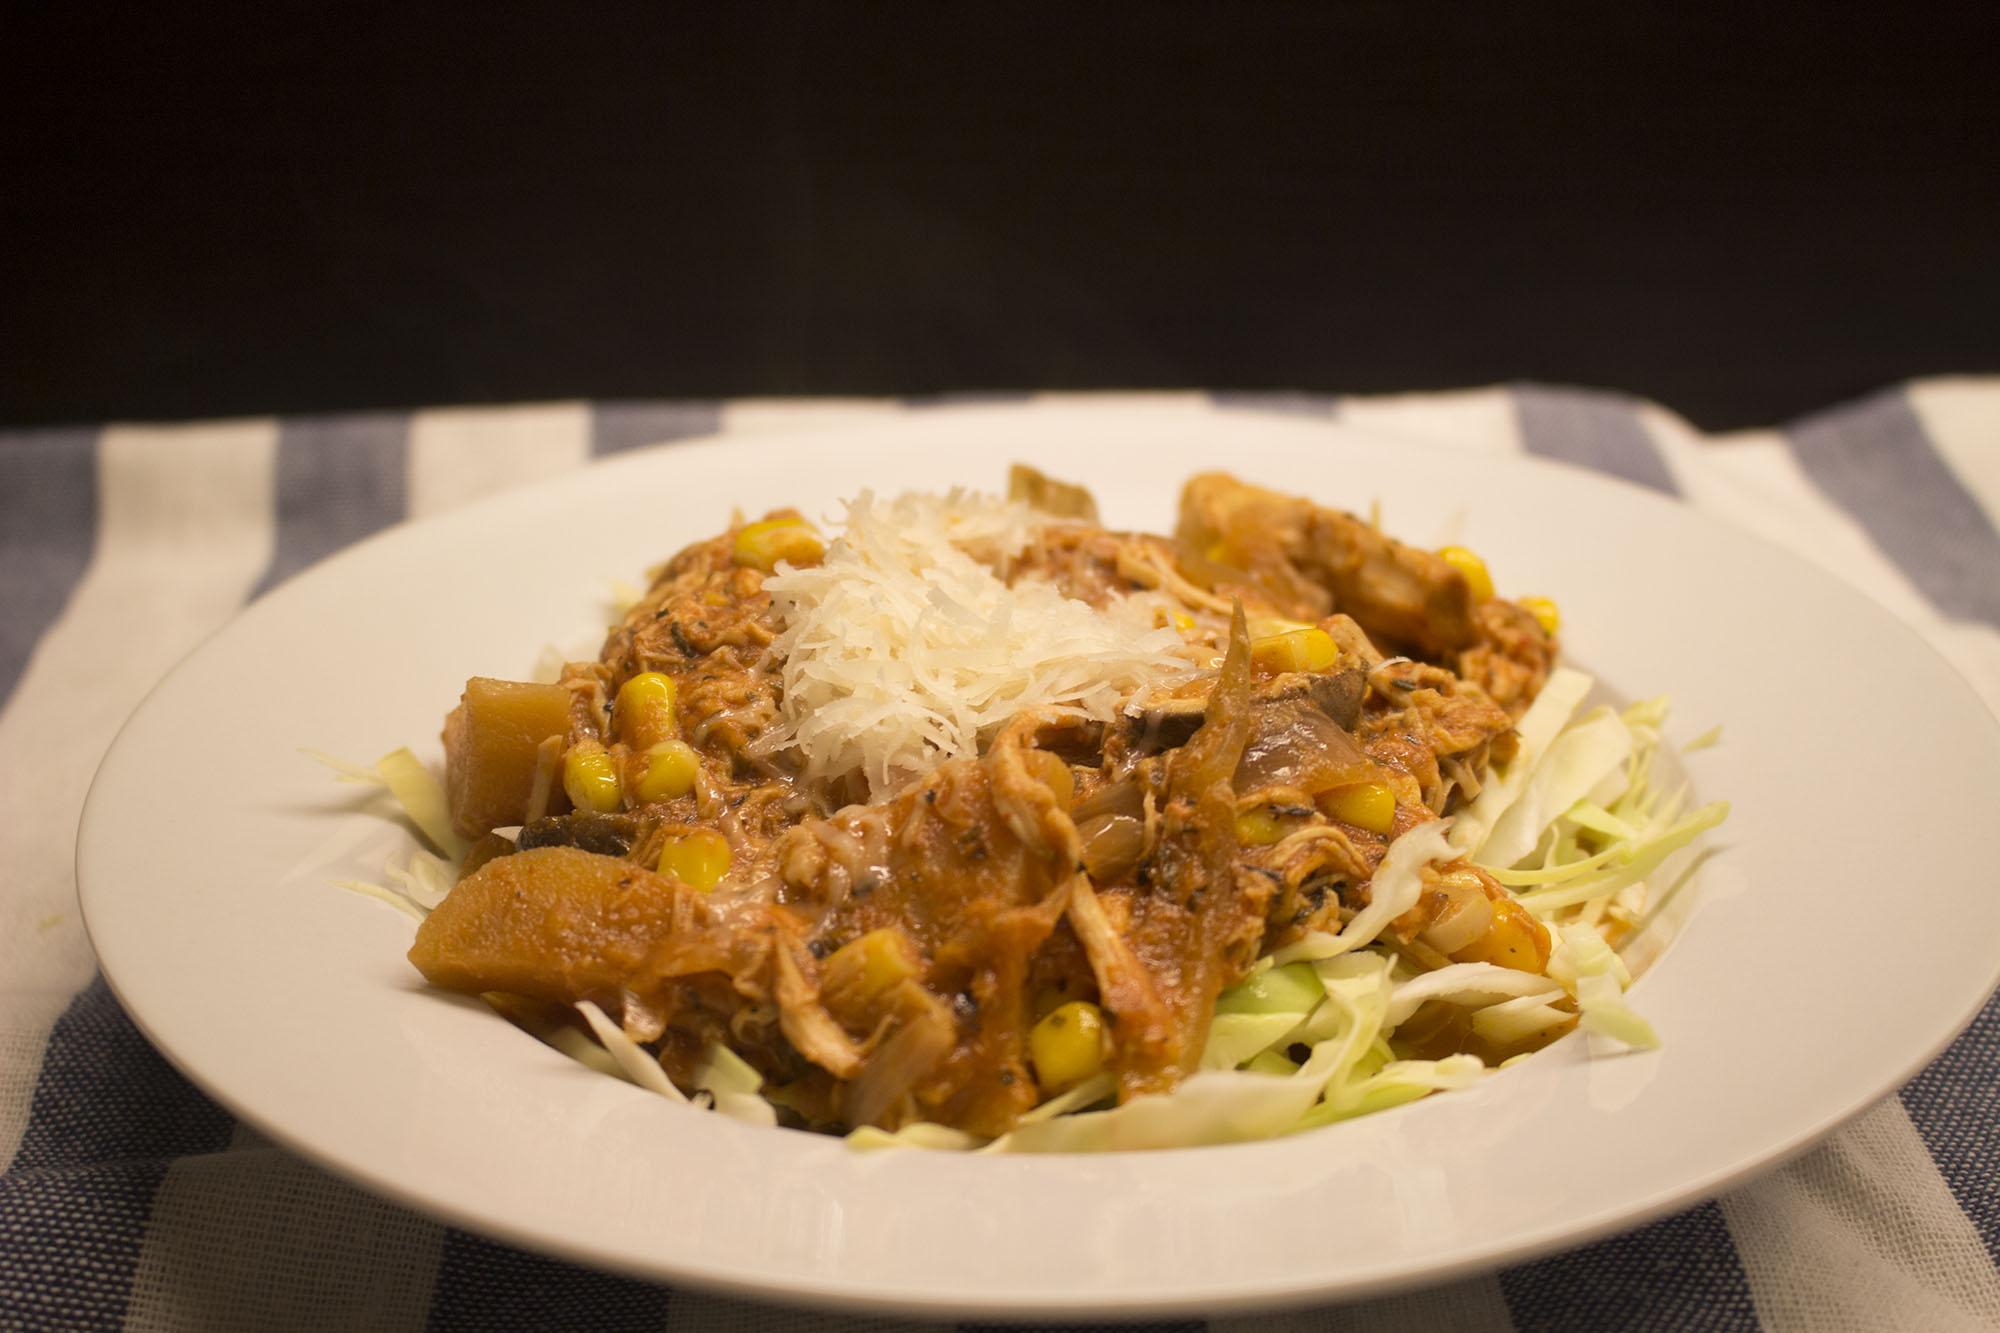 Italiensk kylling i crockpot